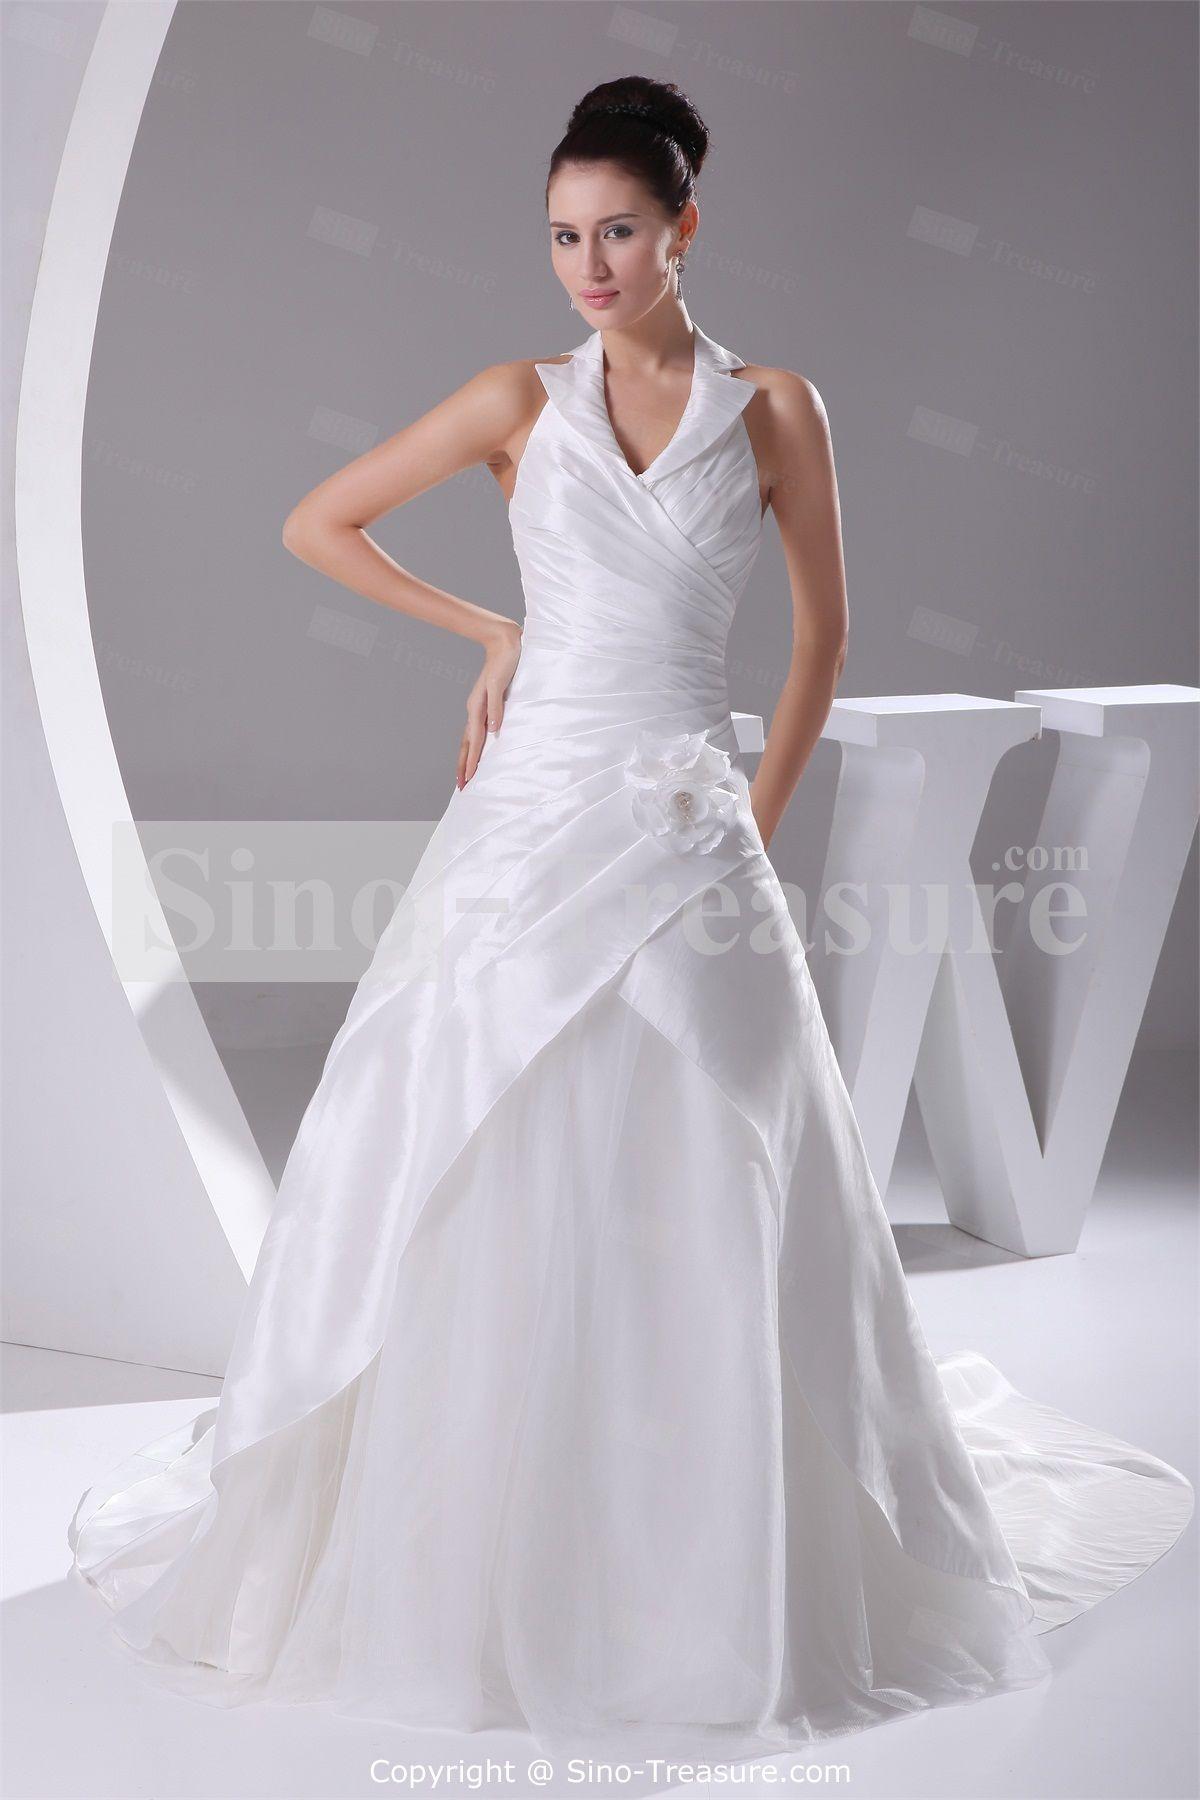 White Corset Back Misses Taffeta A Line Sleeveless Halter Wedding Dress Whole Price Us 249 99